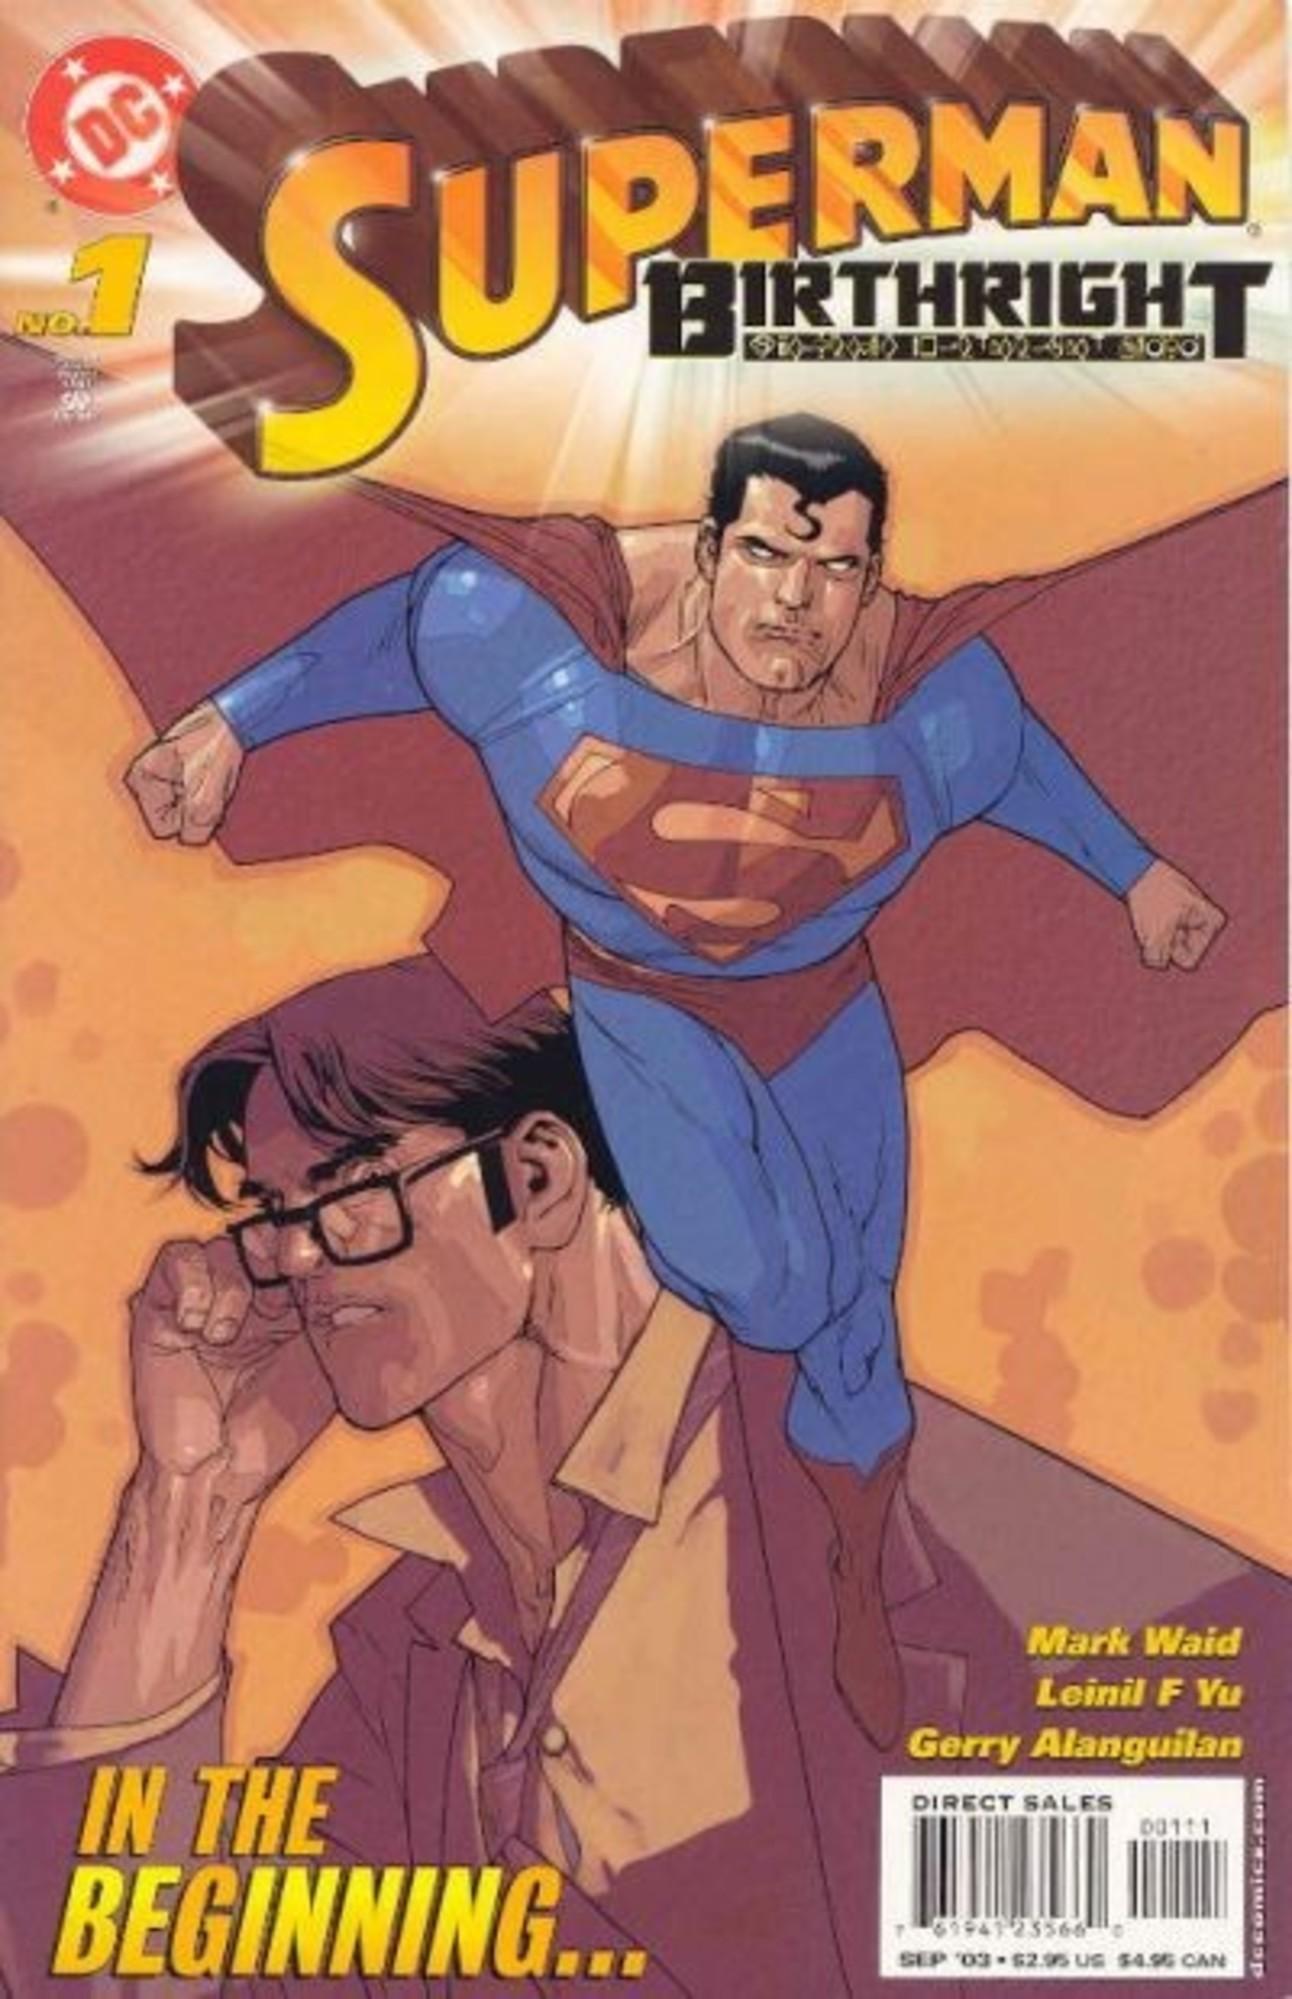 superman_origins_1_birthright.jpg